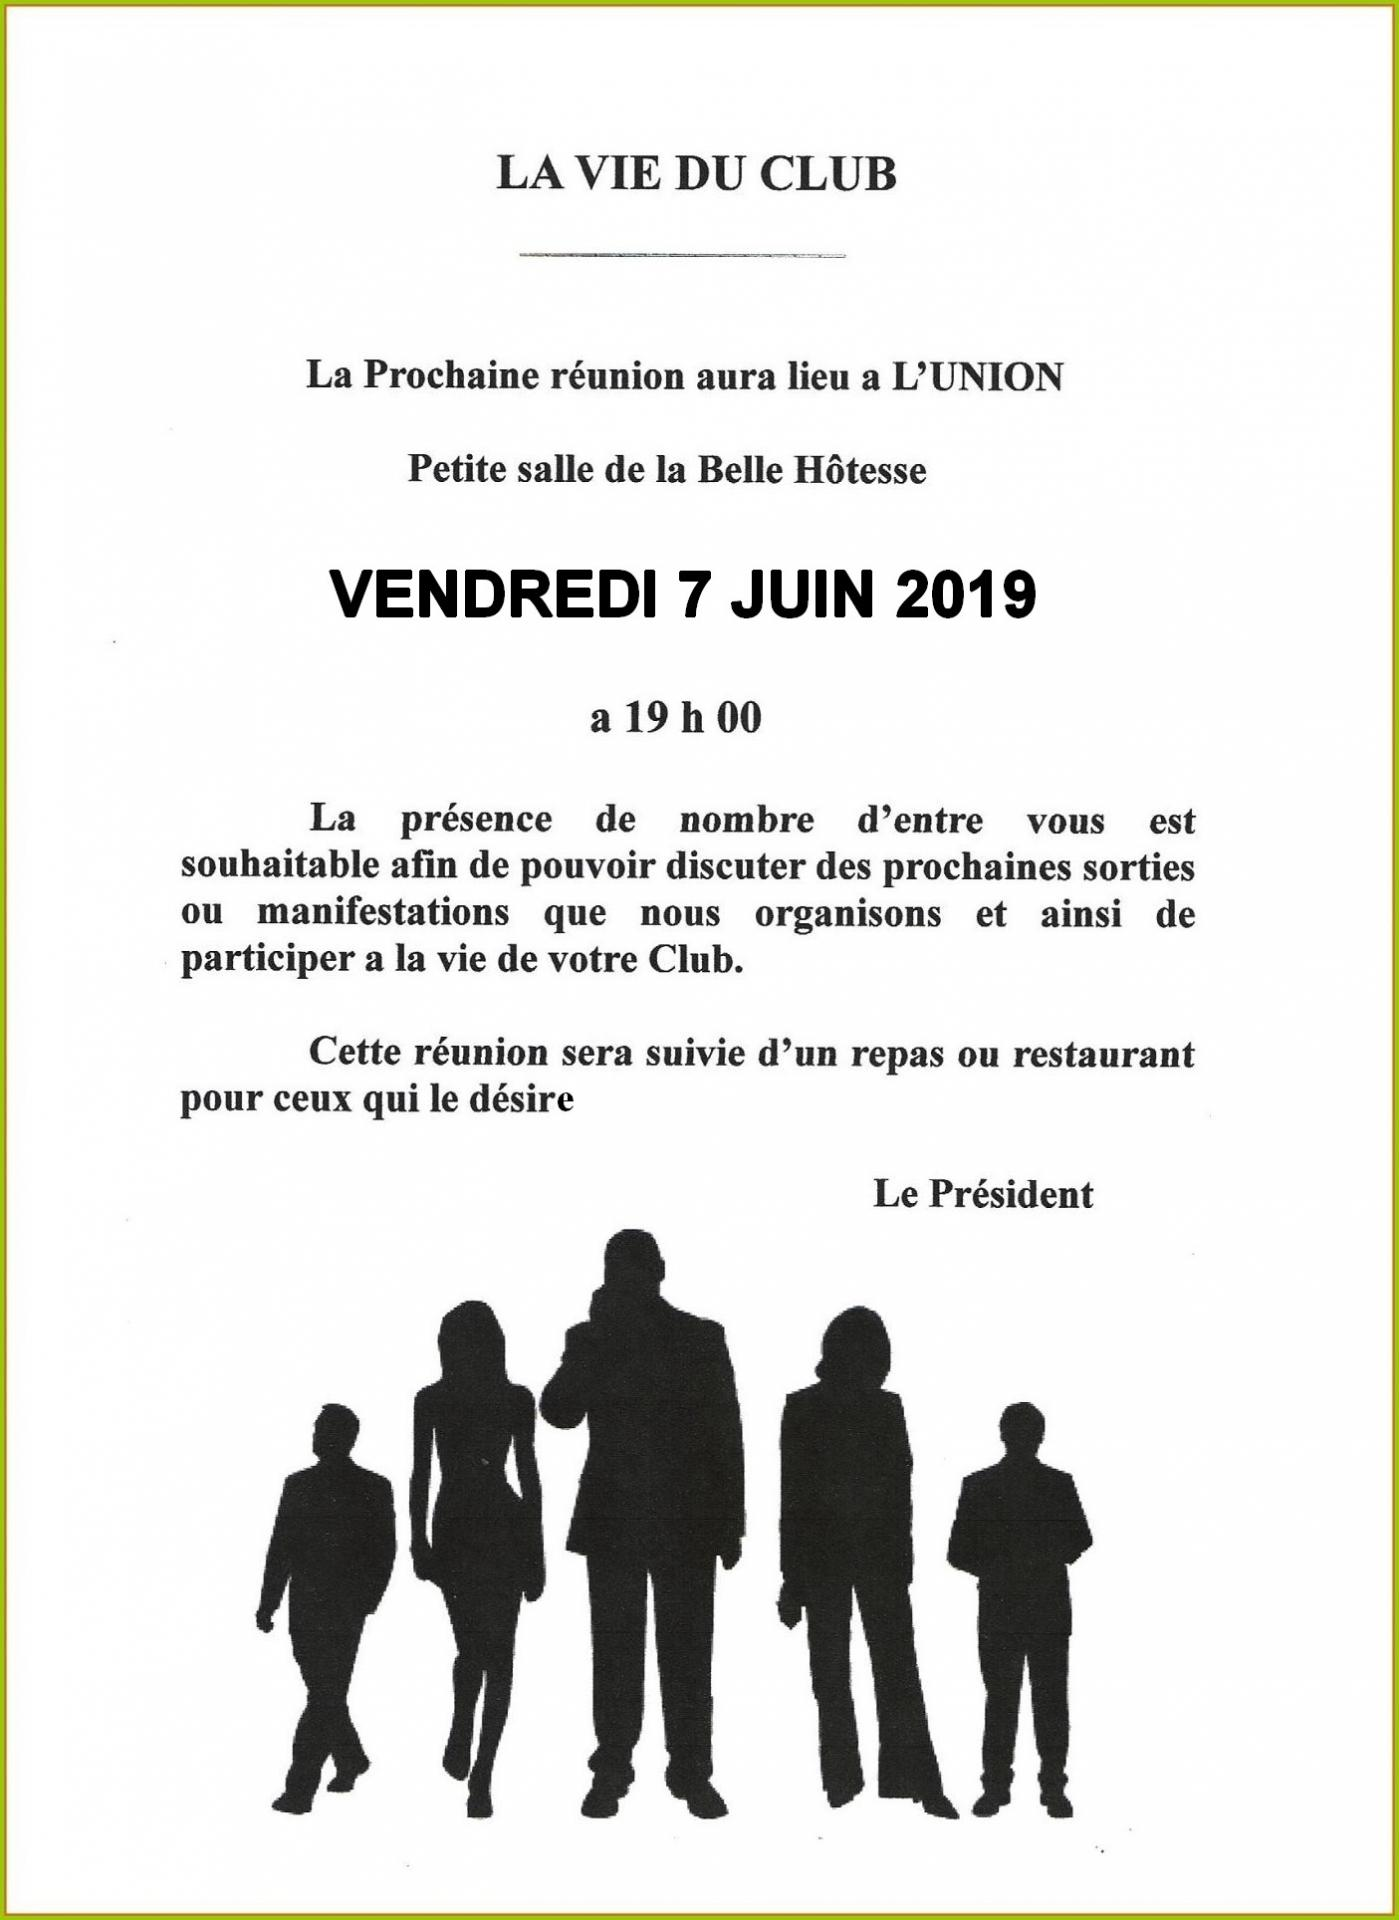 Reunion belle hotesse 03 2019